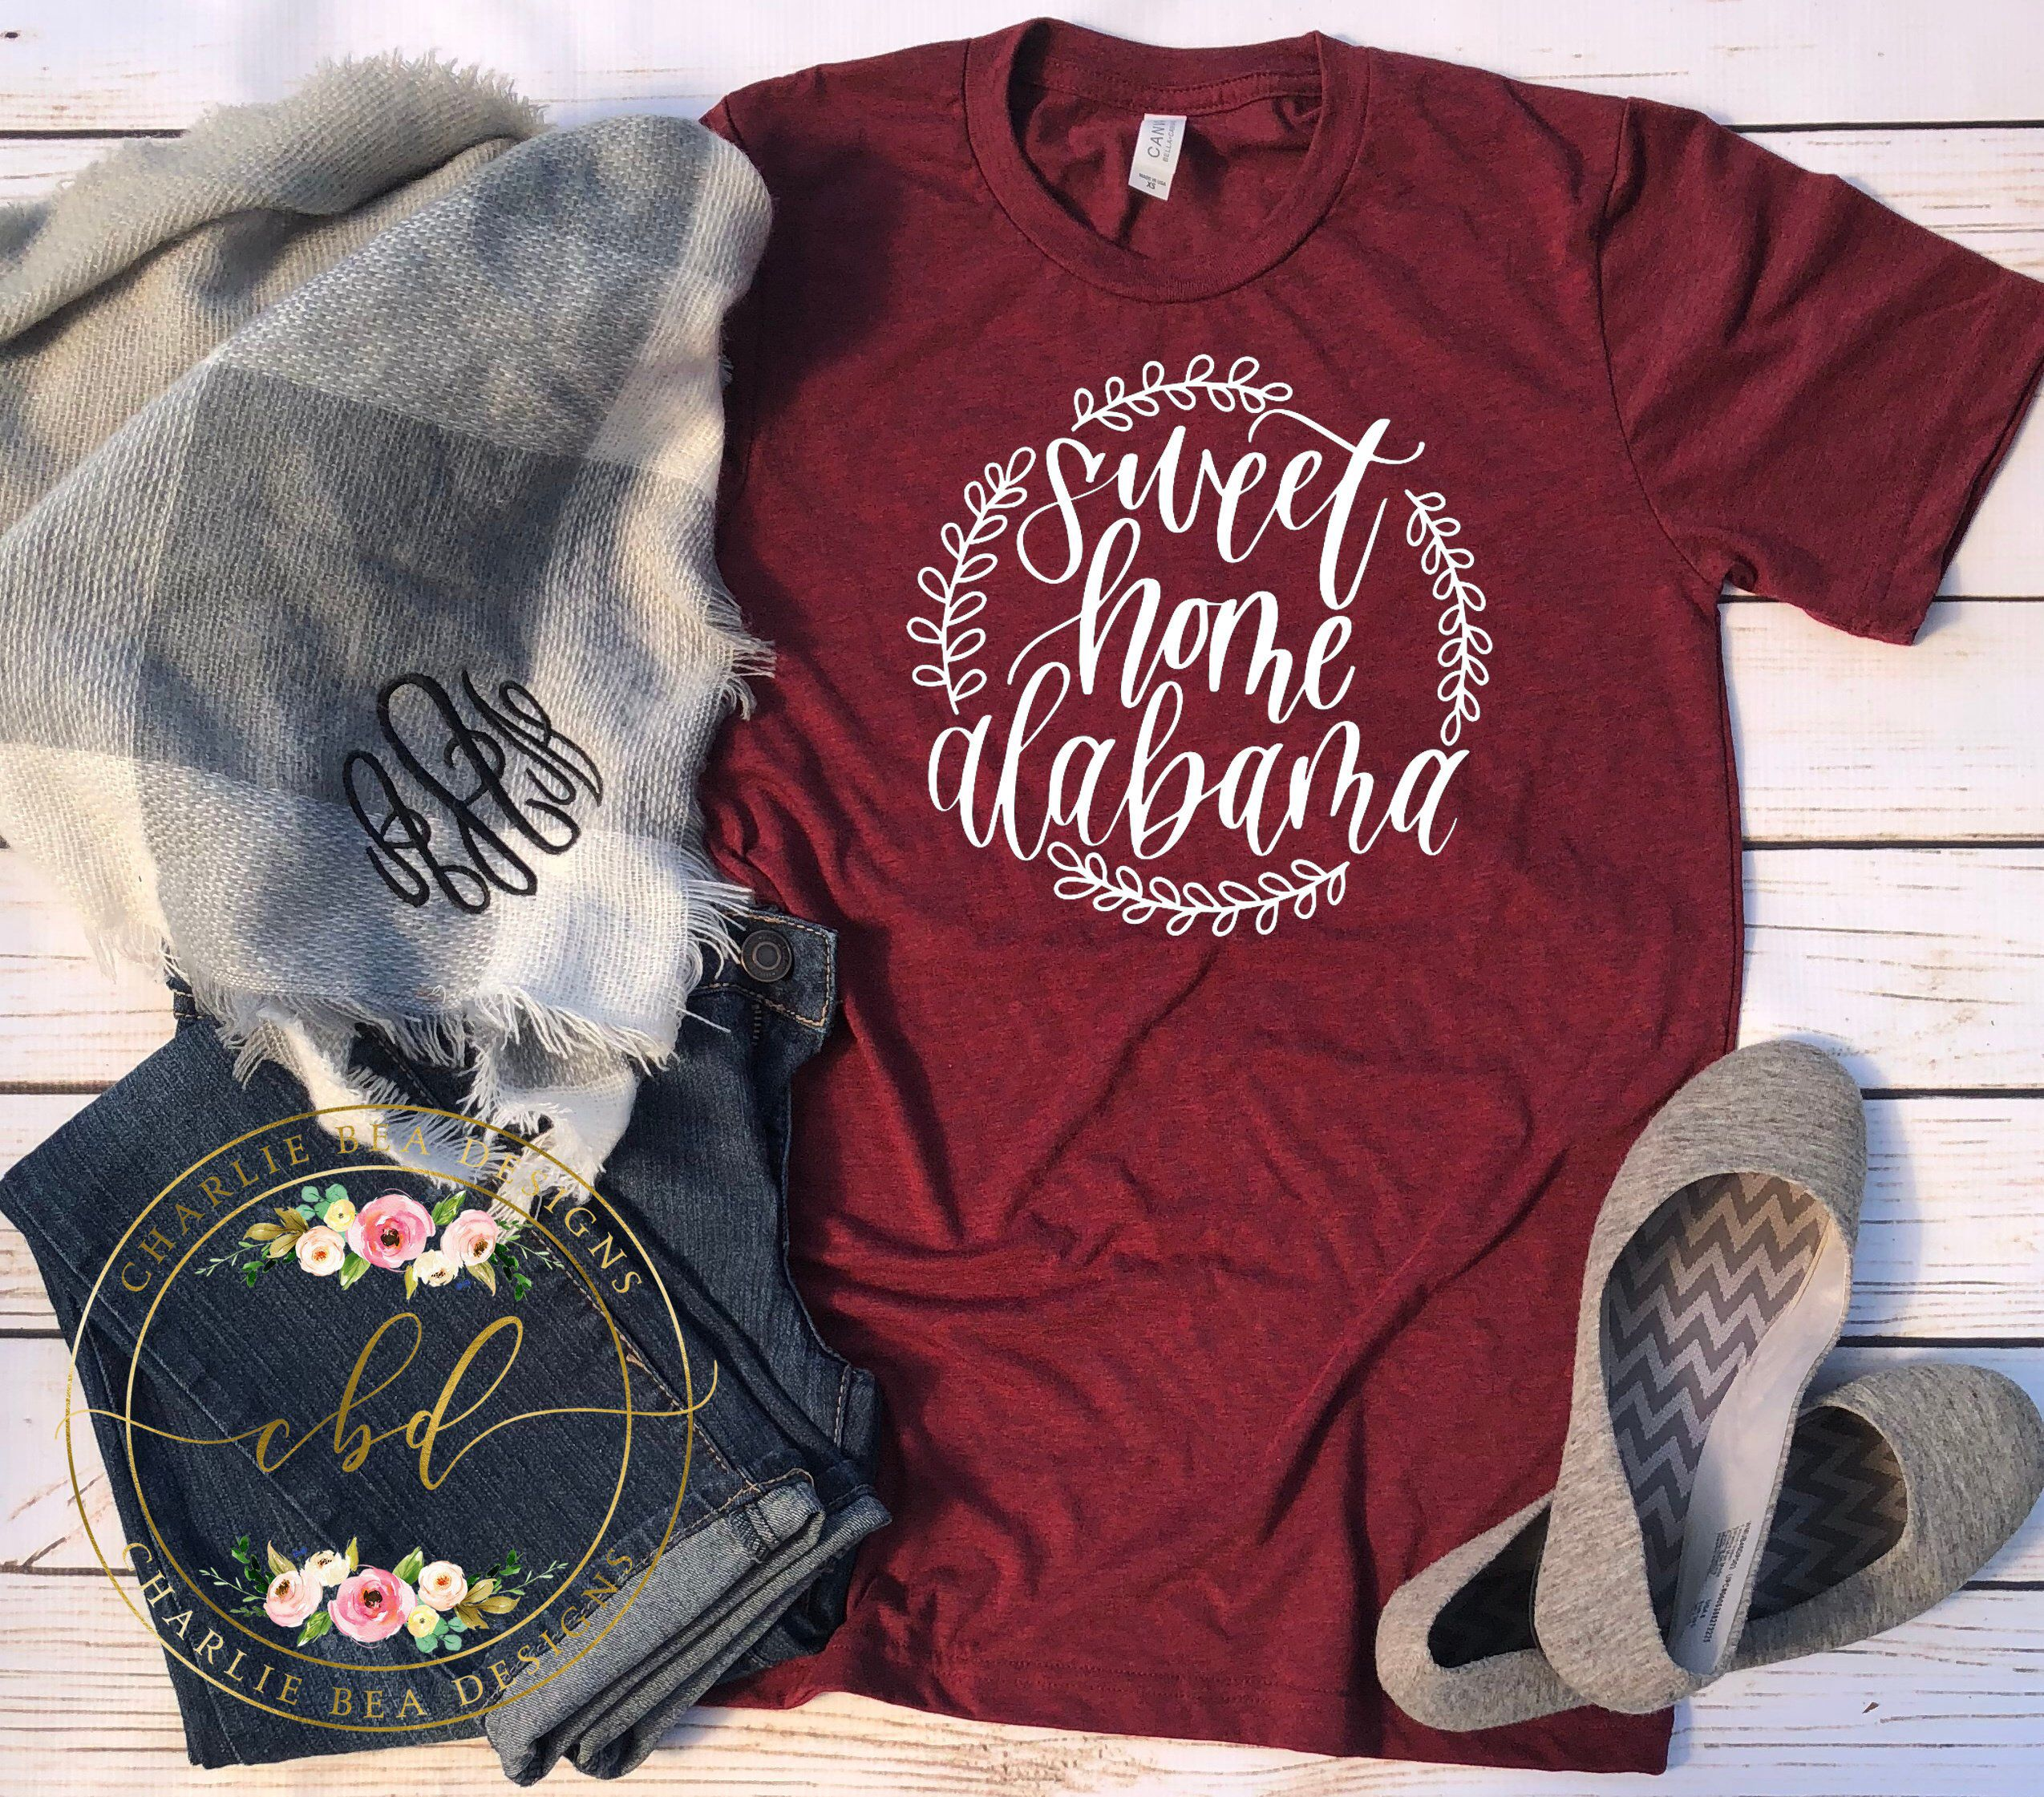 Sweet Home Alabama Shirt Sweet Home Alabama Alabama Etsy In 2020 Alabama Shirts Alabama T Shirts Fall Tee Shirts